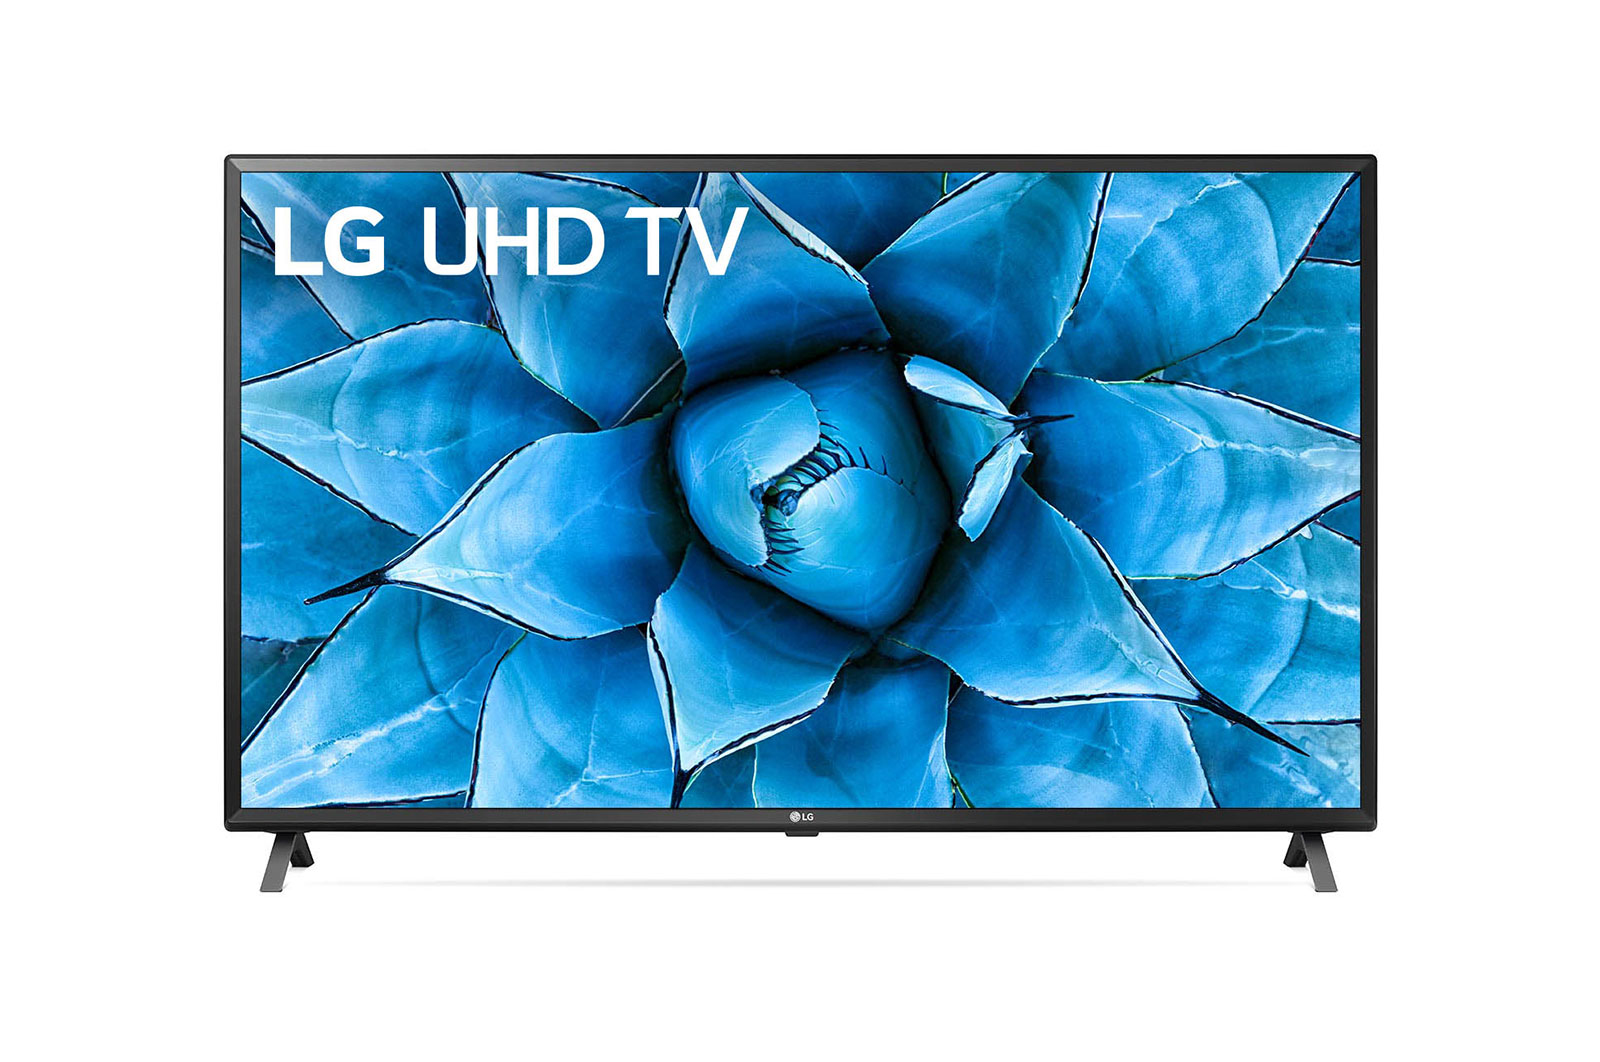 "LG 49UN73006LA TV 124.5 cm (49"") 4K Ultra HD Smart TV Wi-Fi Black"